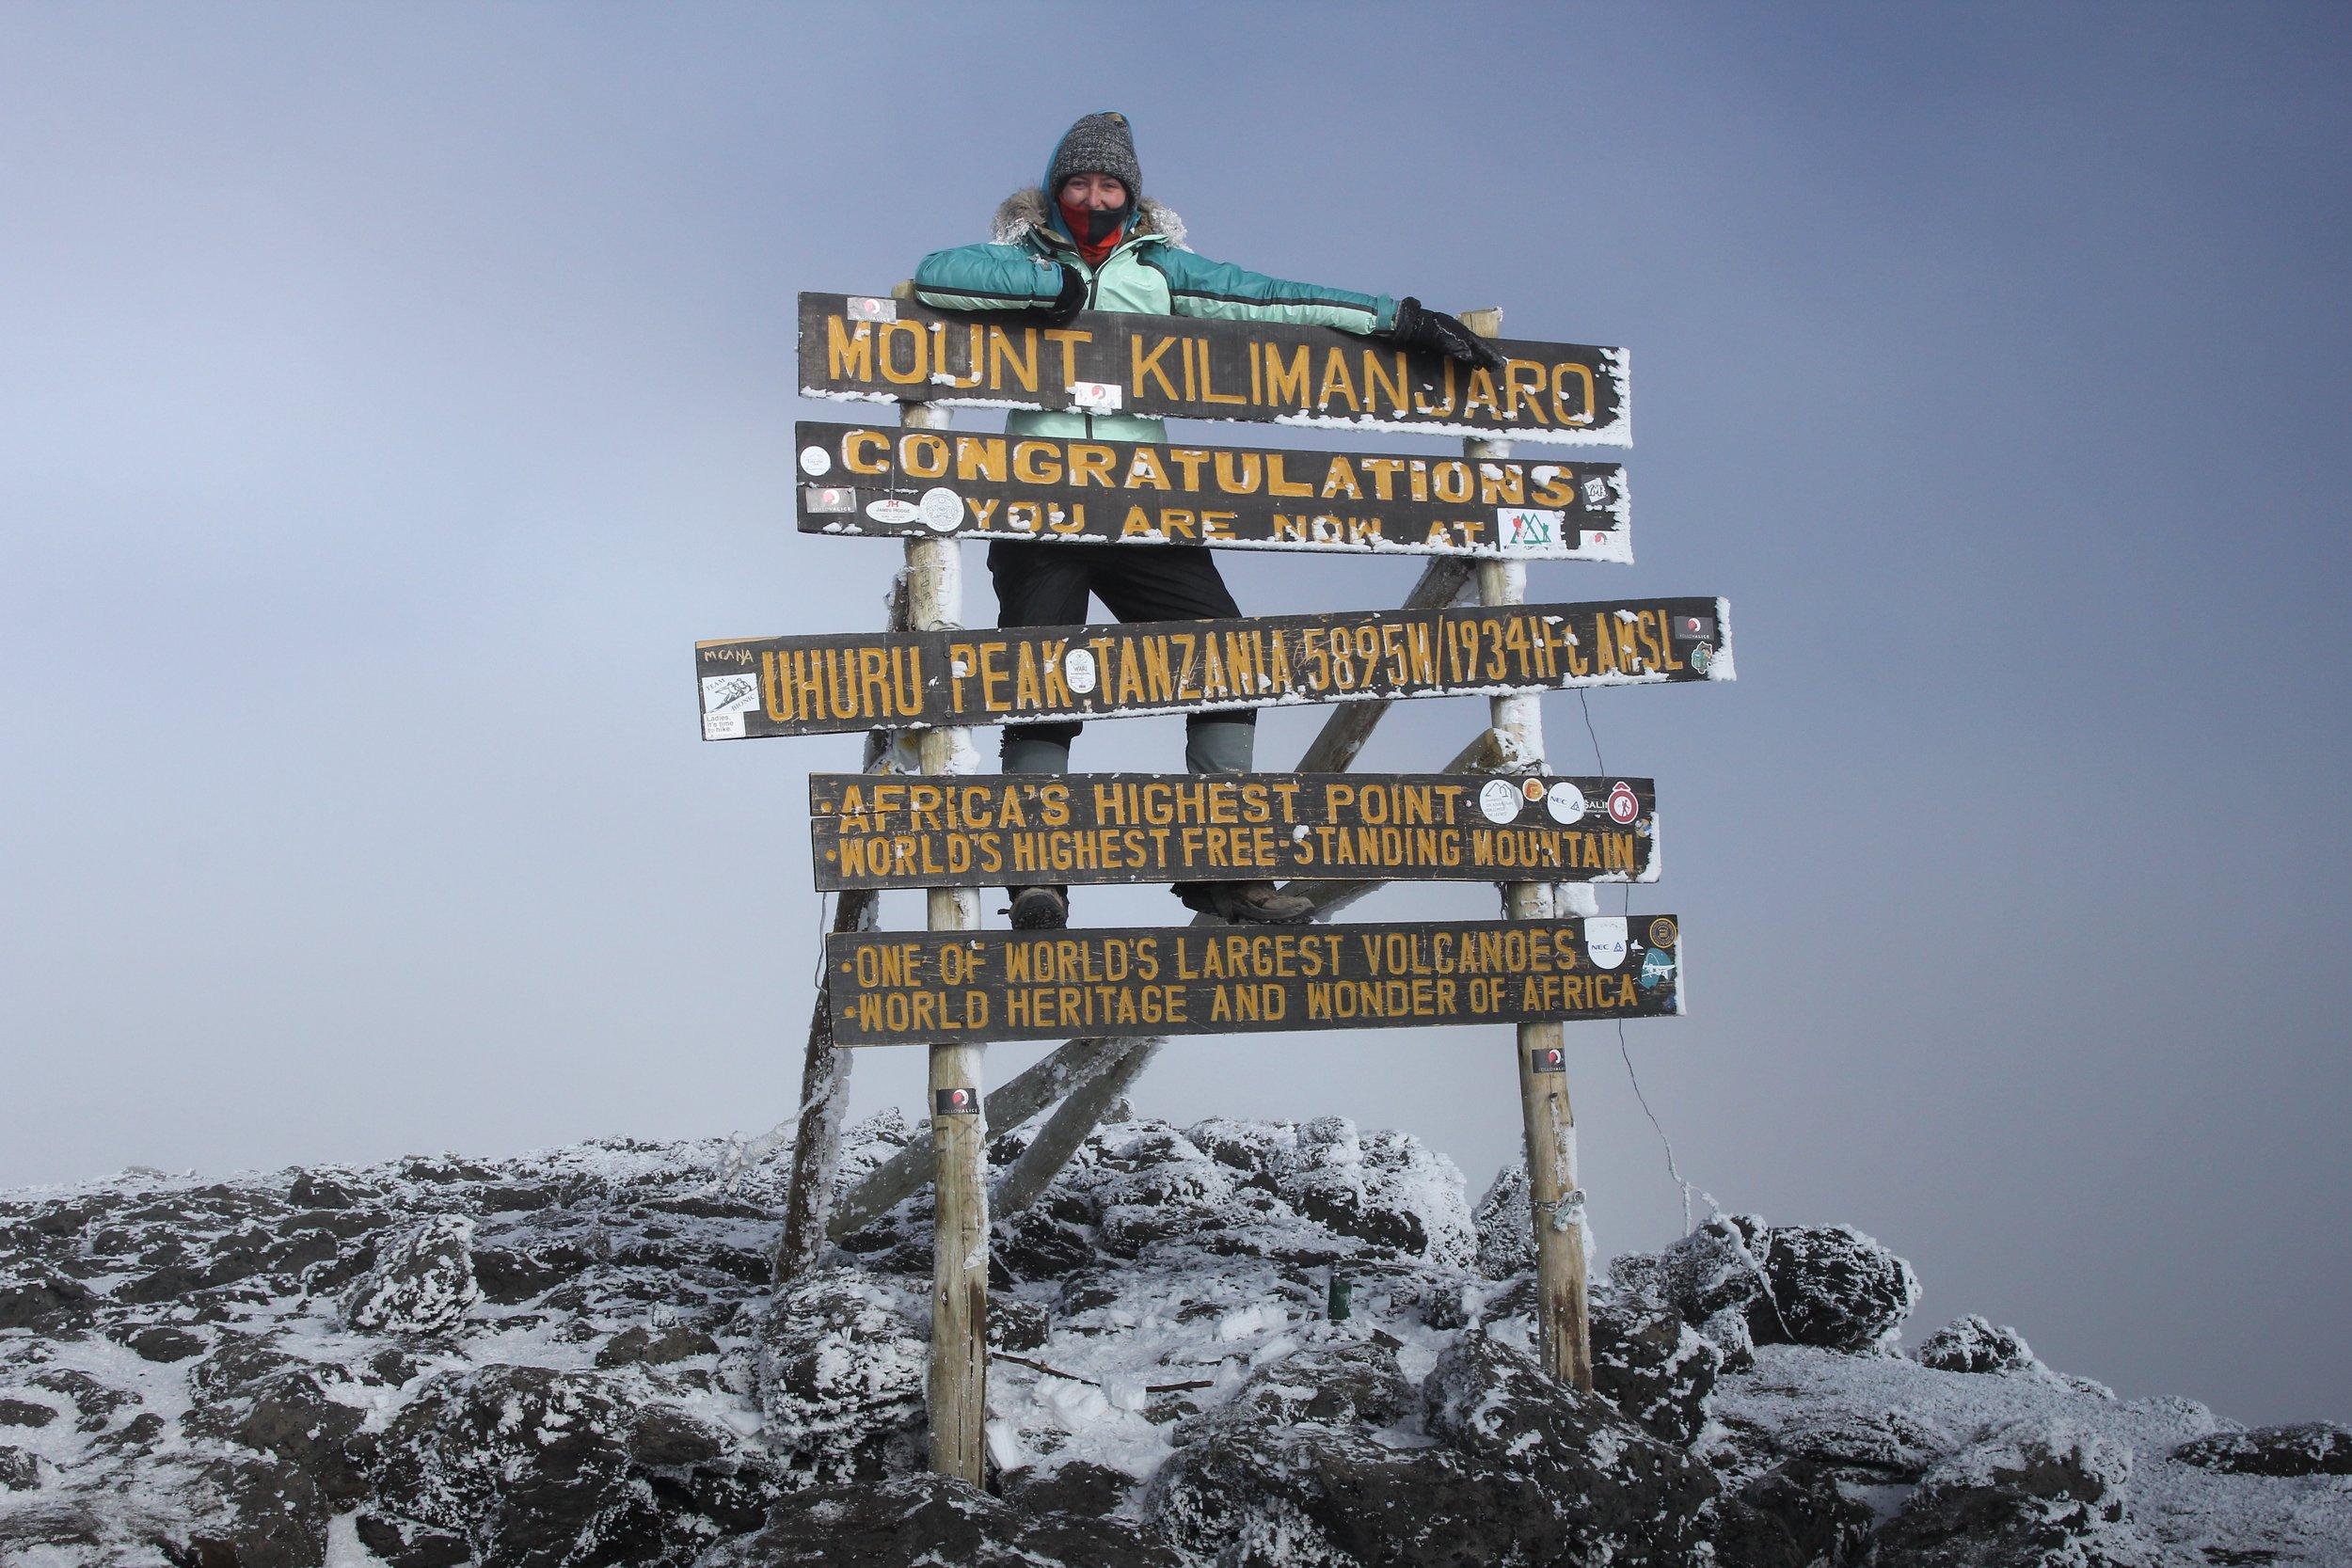 climbing_kilimanjaro_adventure_travelling